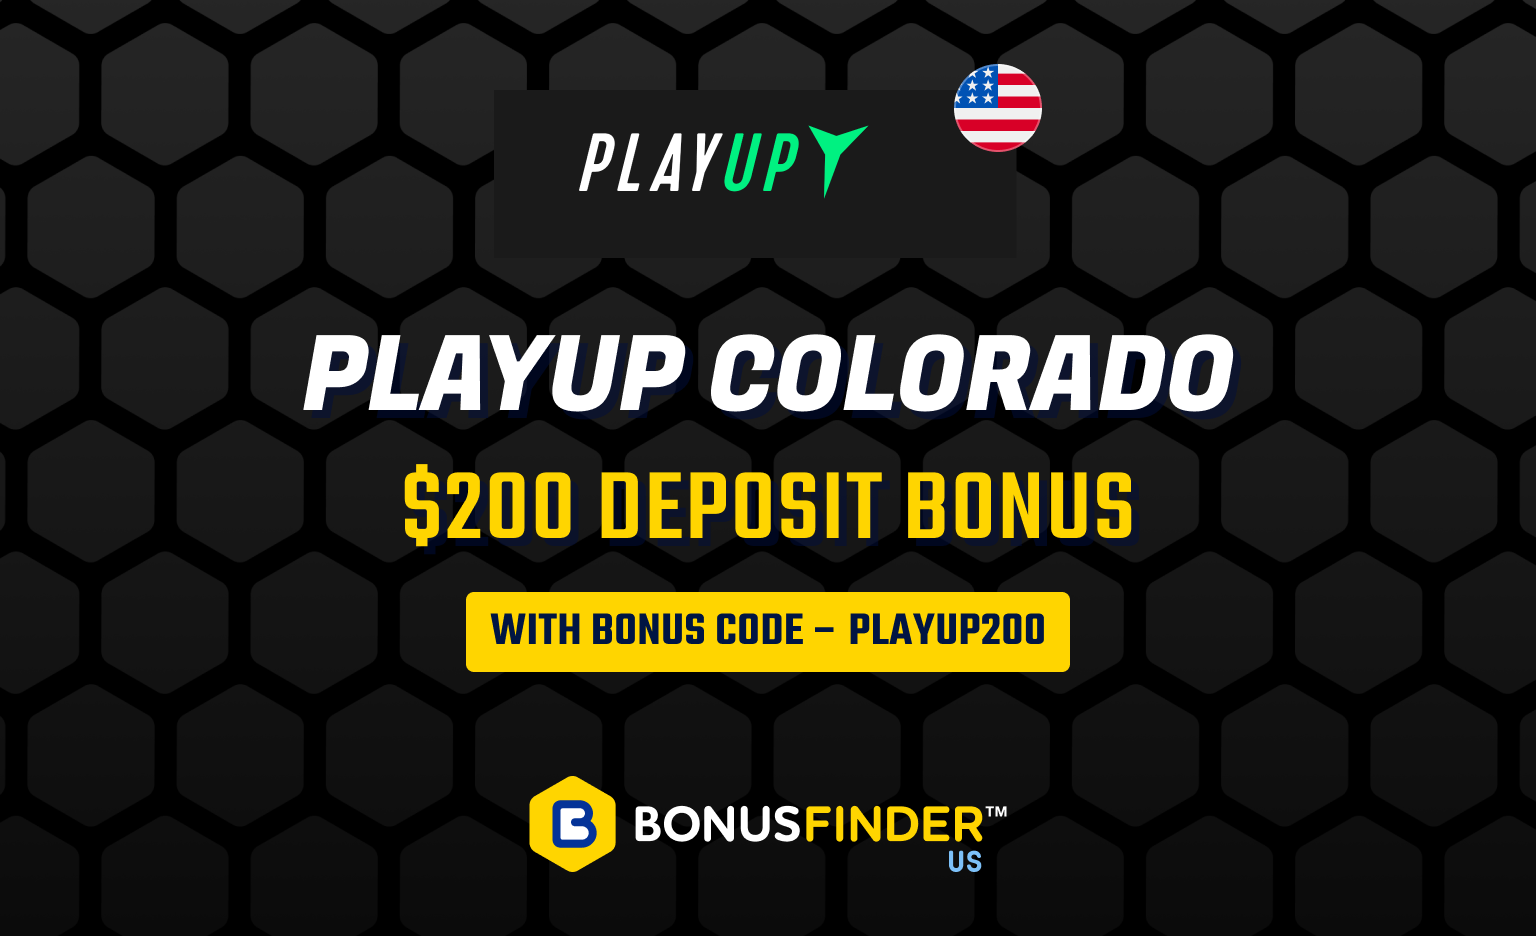 PlayUp Colorado promo code